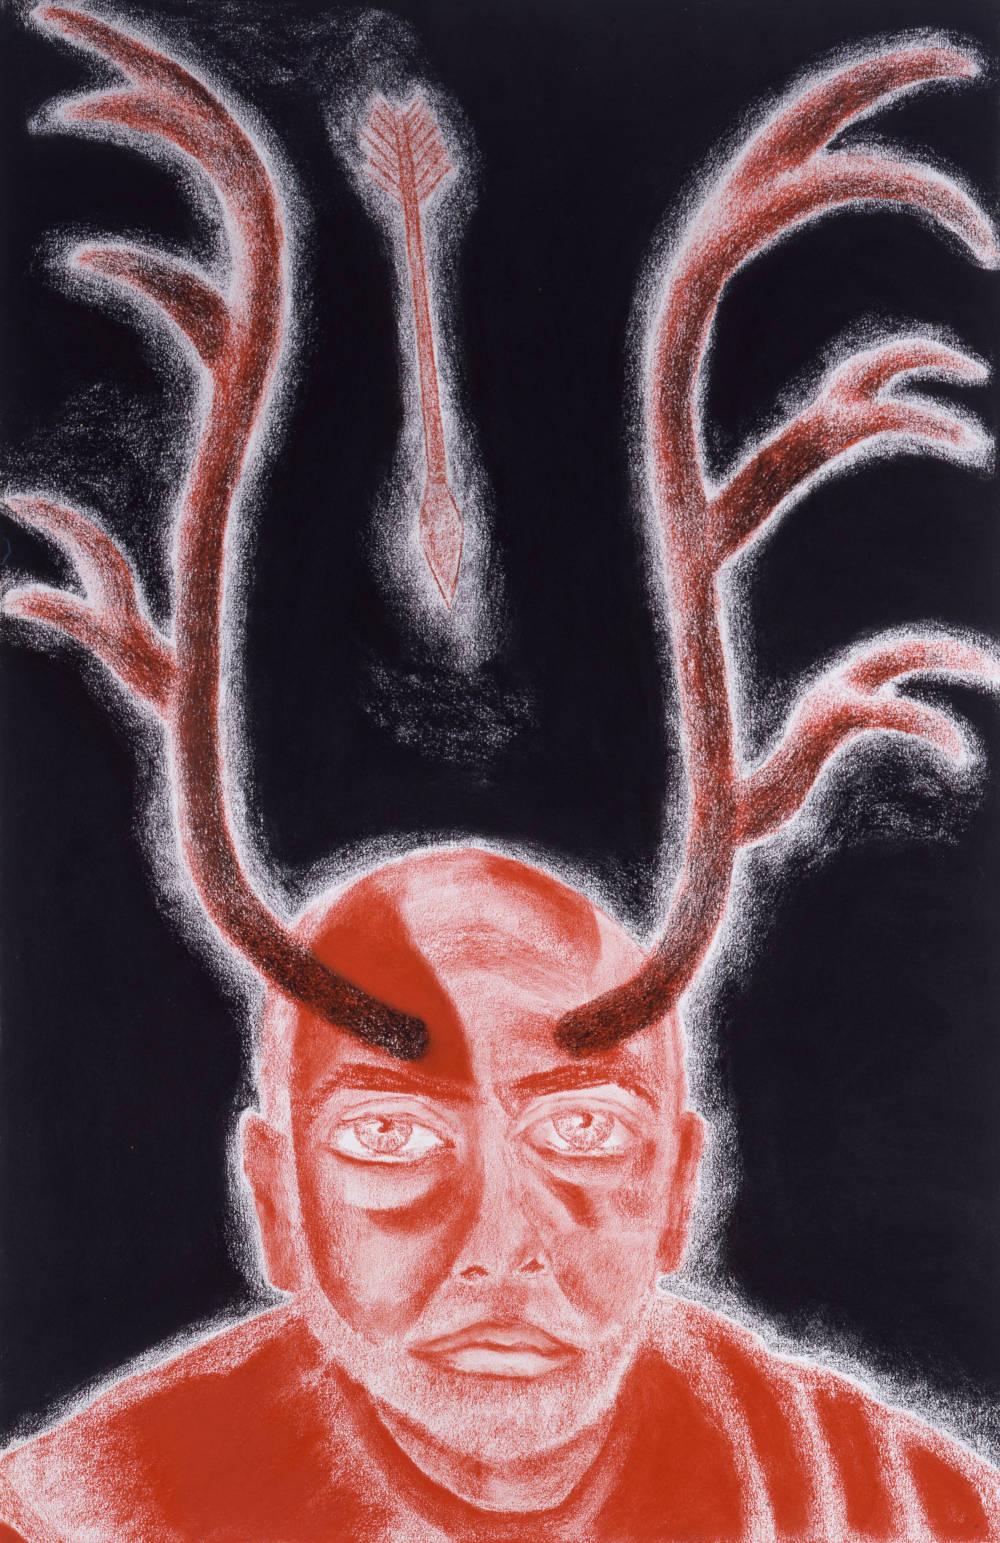 Self-Portrait in White, Red and Black IX